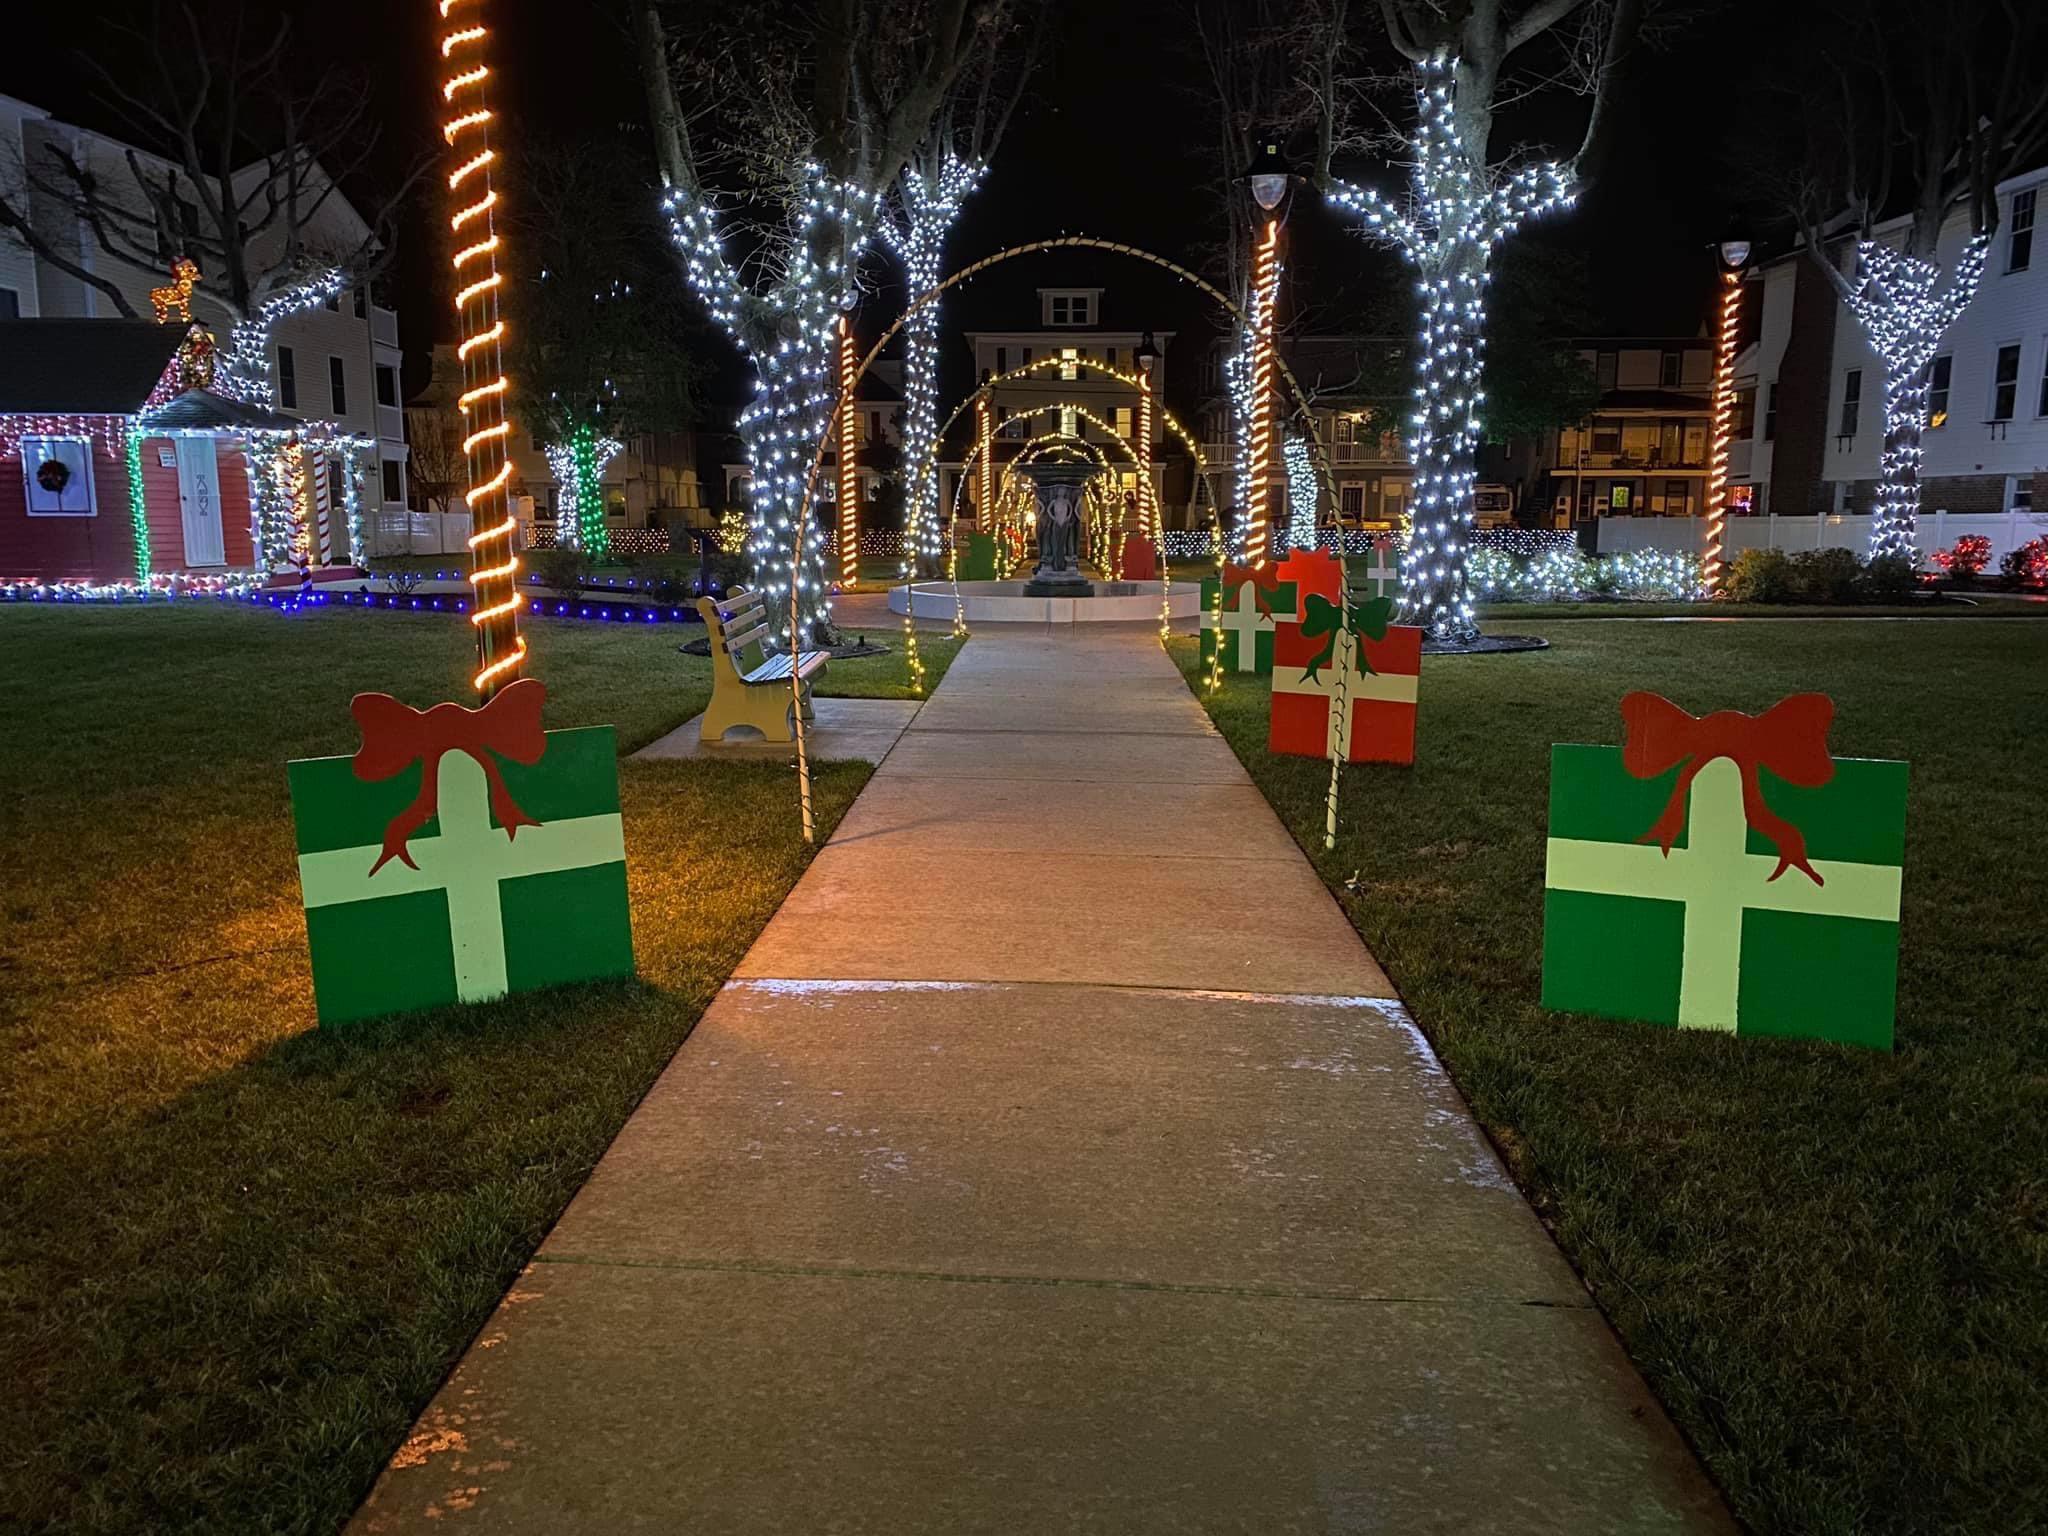 Holly Beach Park Holiday Display